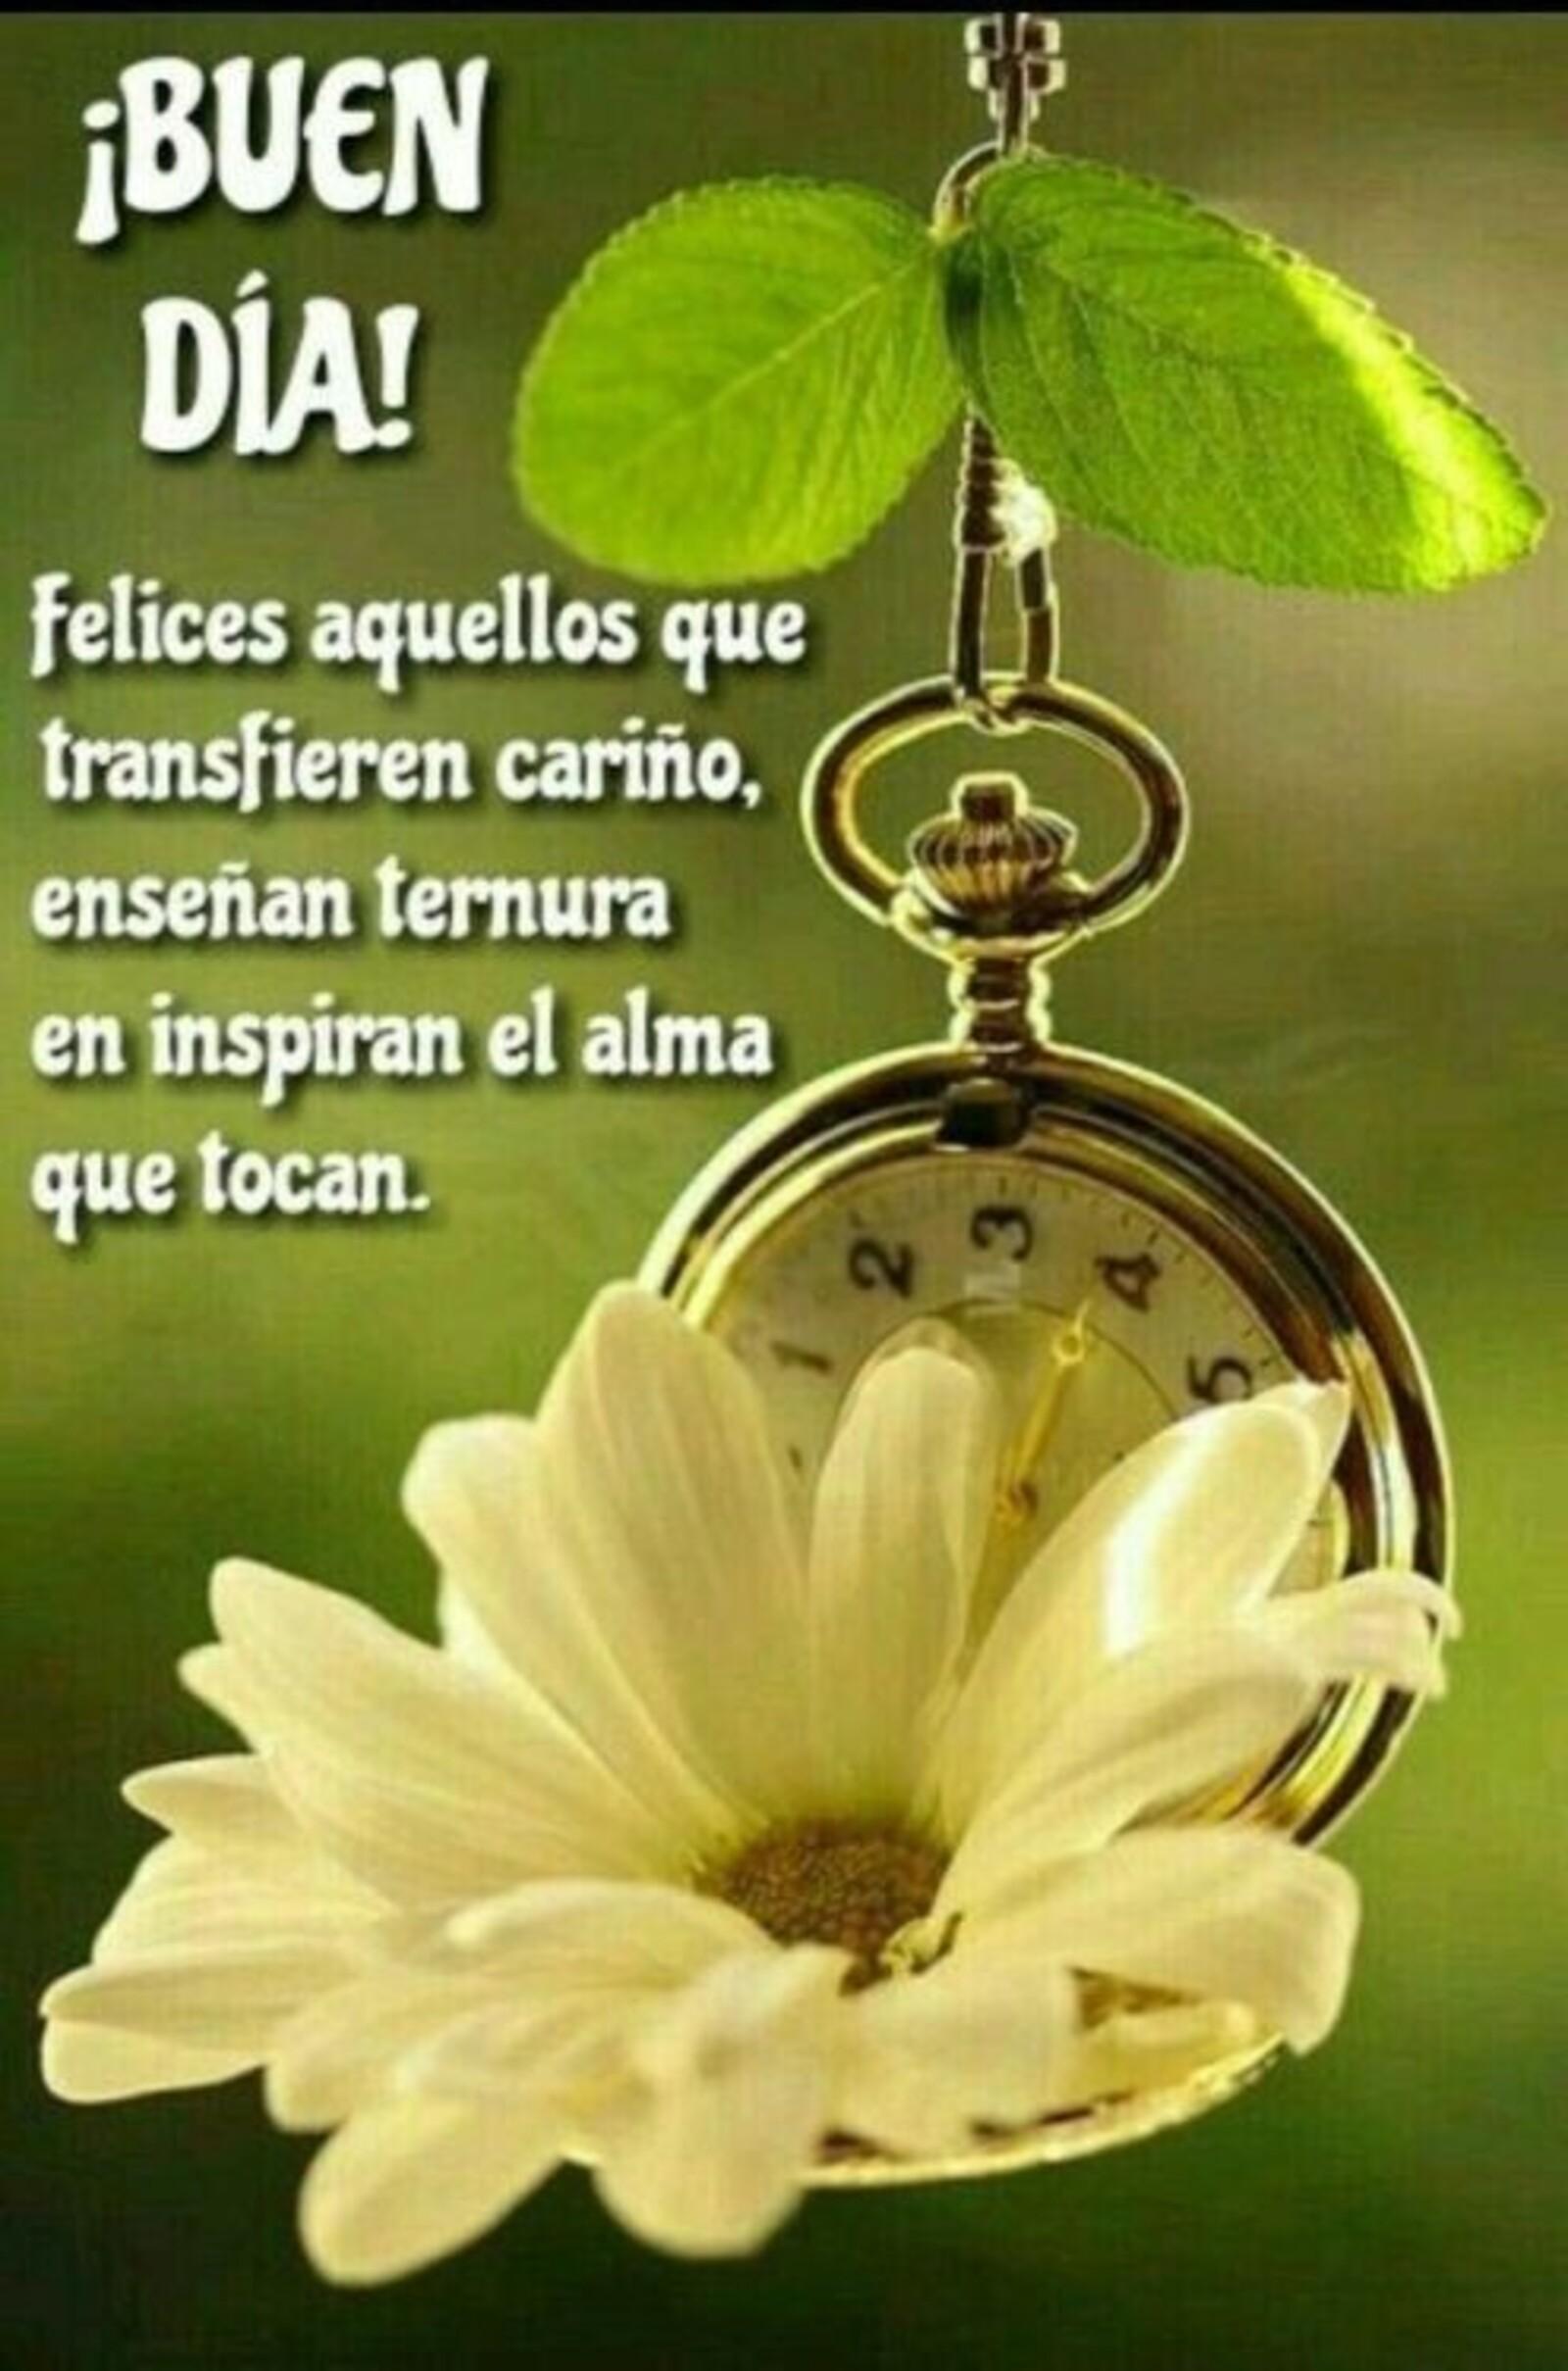 Buen día! Felices aquellos que transfieren cariño, enseñan ternura en inspiran el alma que tocan.